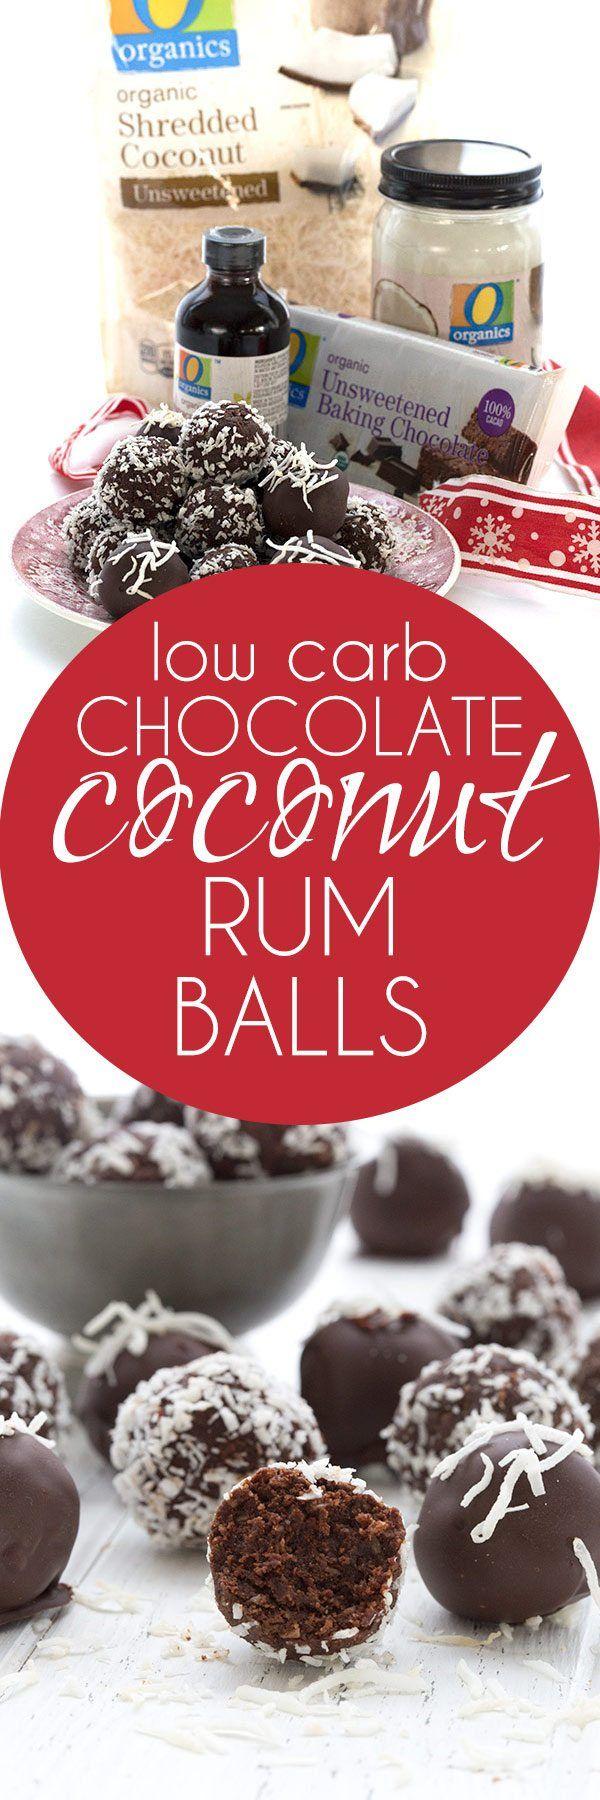 Easy low carb and dairy-free Chocolate Rum Balls. A perfect keto holiday treat! #lowcarb #keto #dairyfree #sugarfree #holidays via @dreamaboutfood